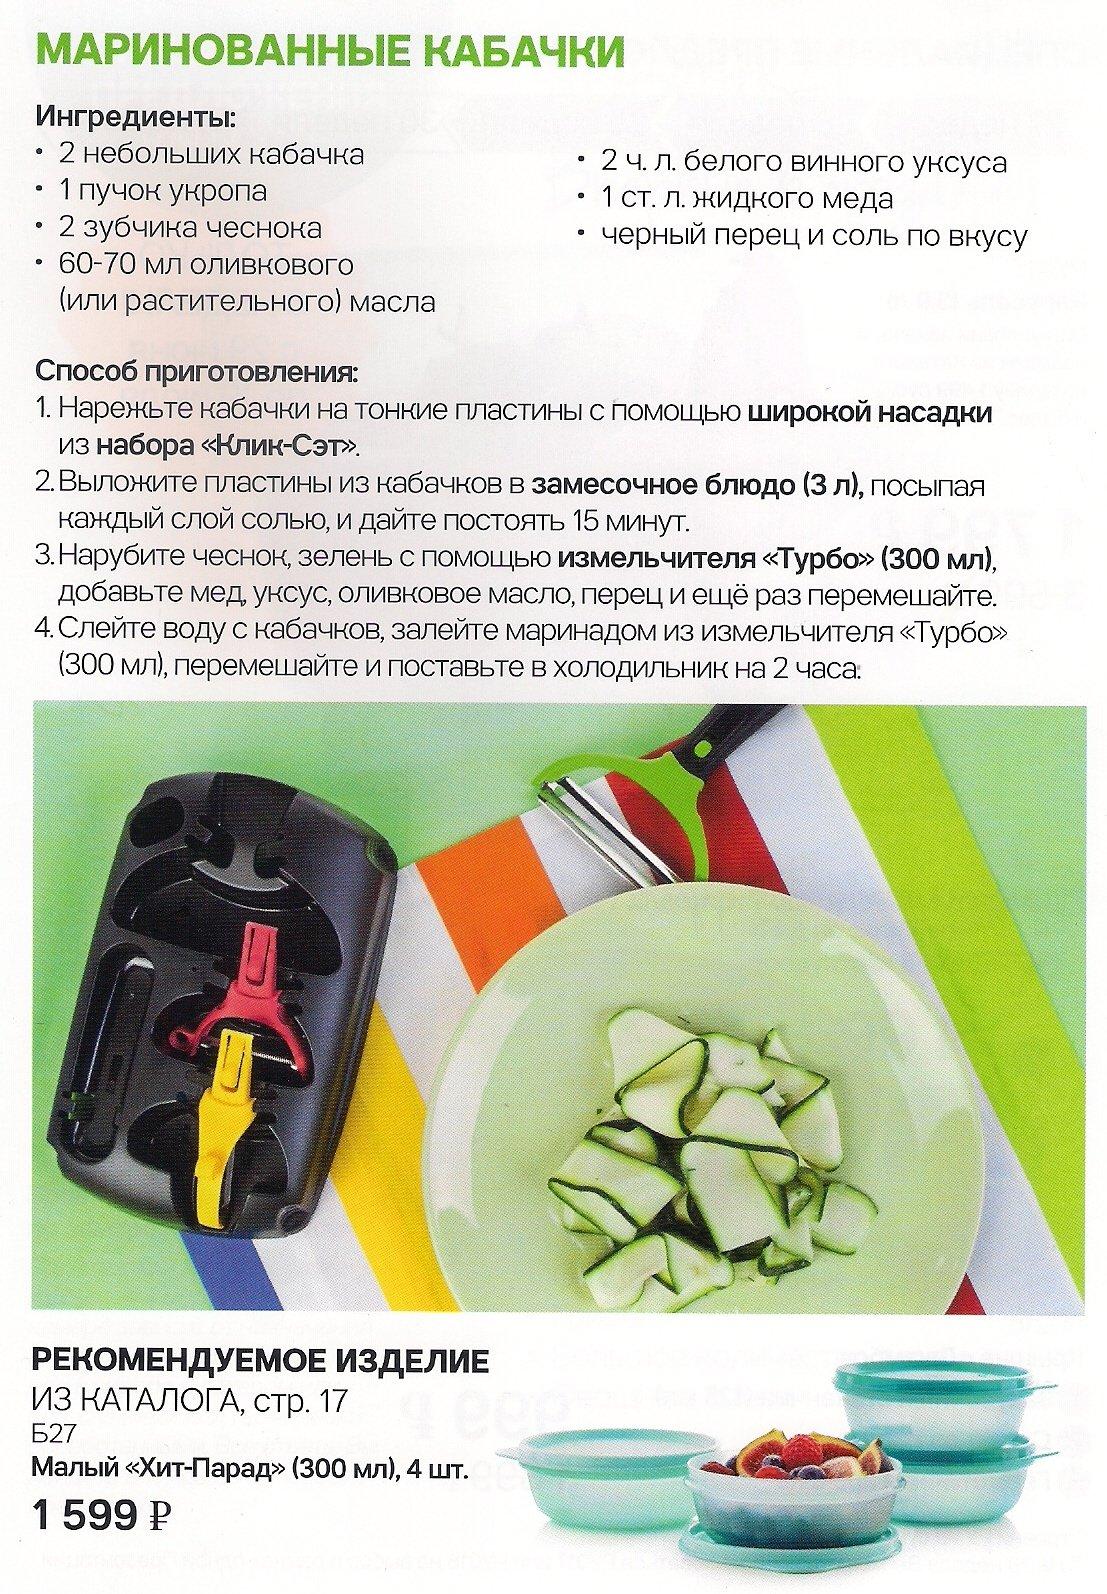 https://tupperware-online.ru/images/upload/9a.jpg